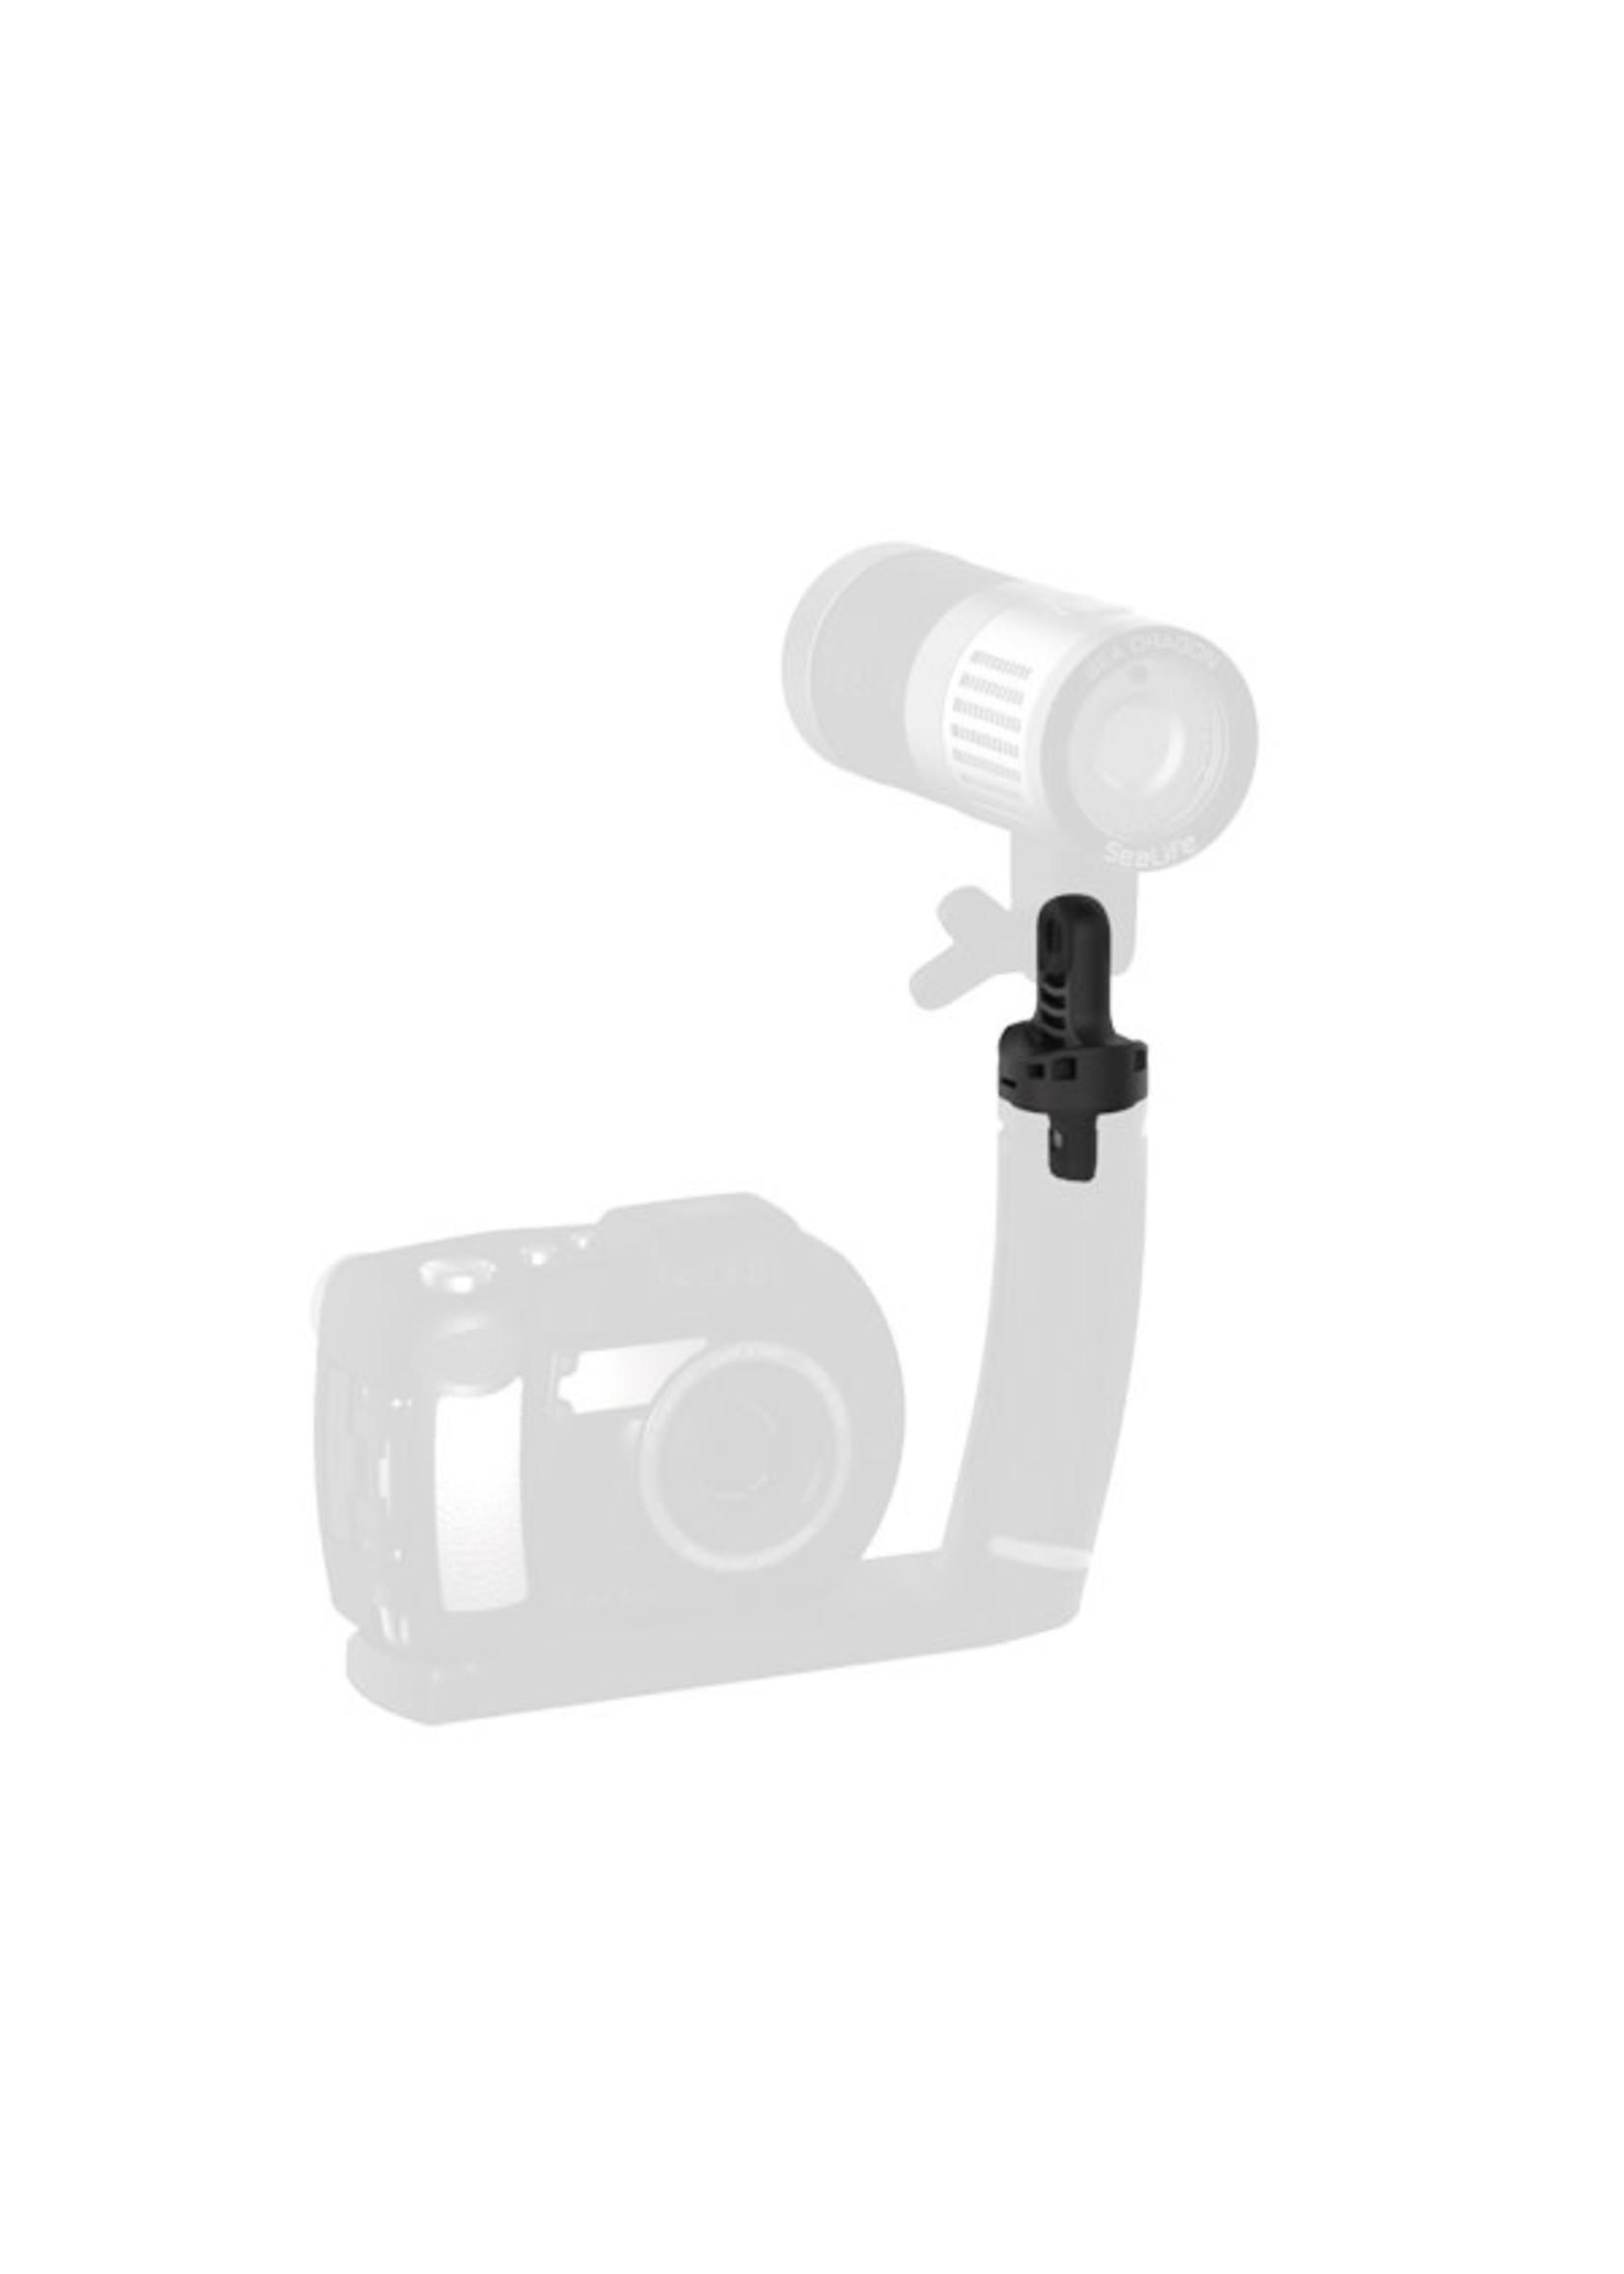 Sealife Flex-Connect YS Adapter